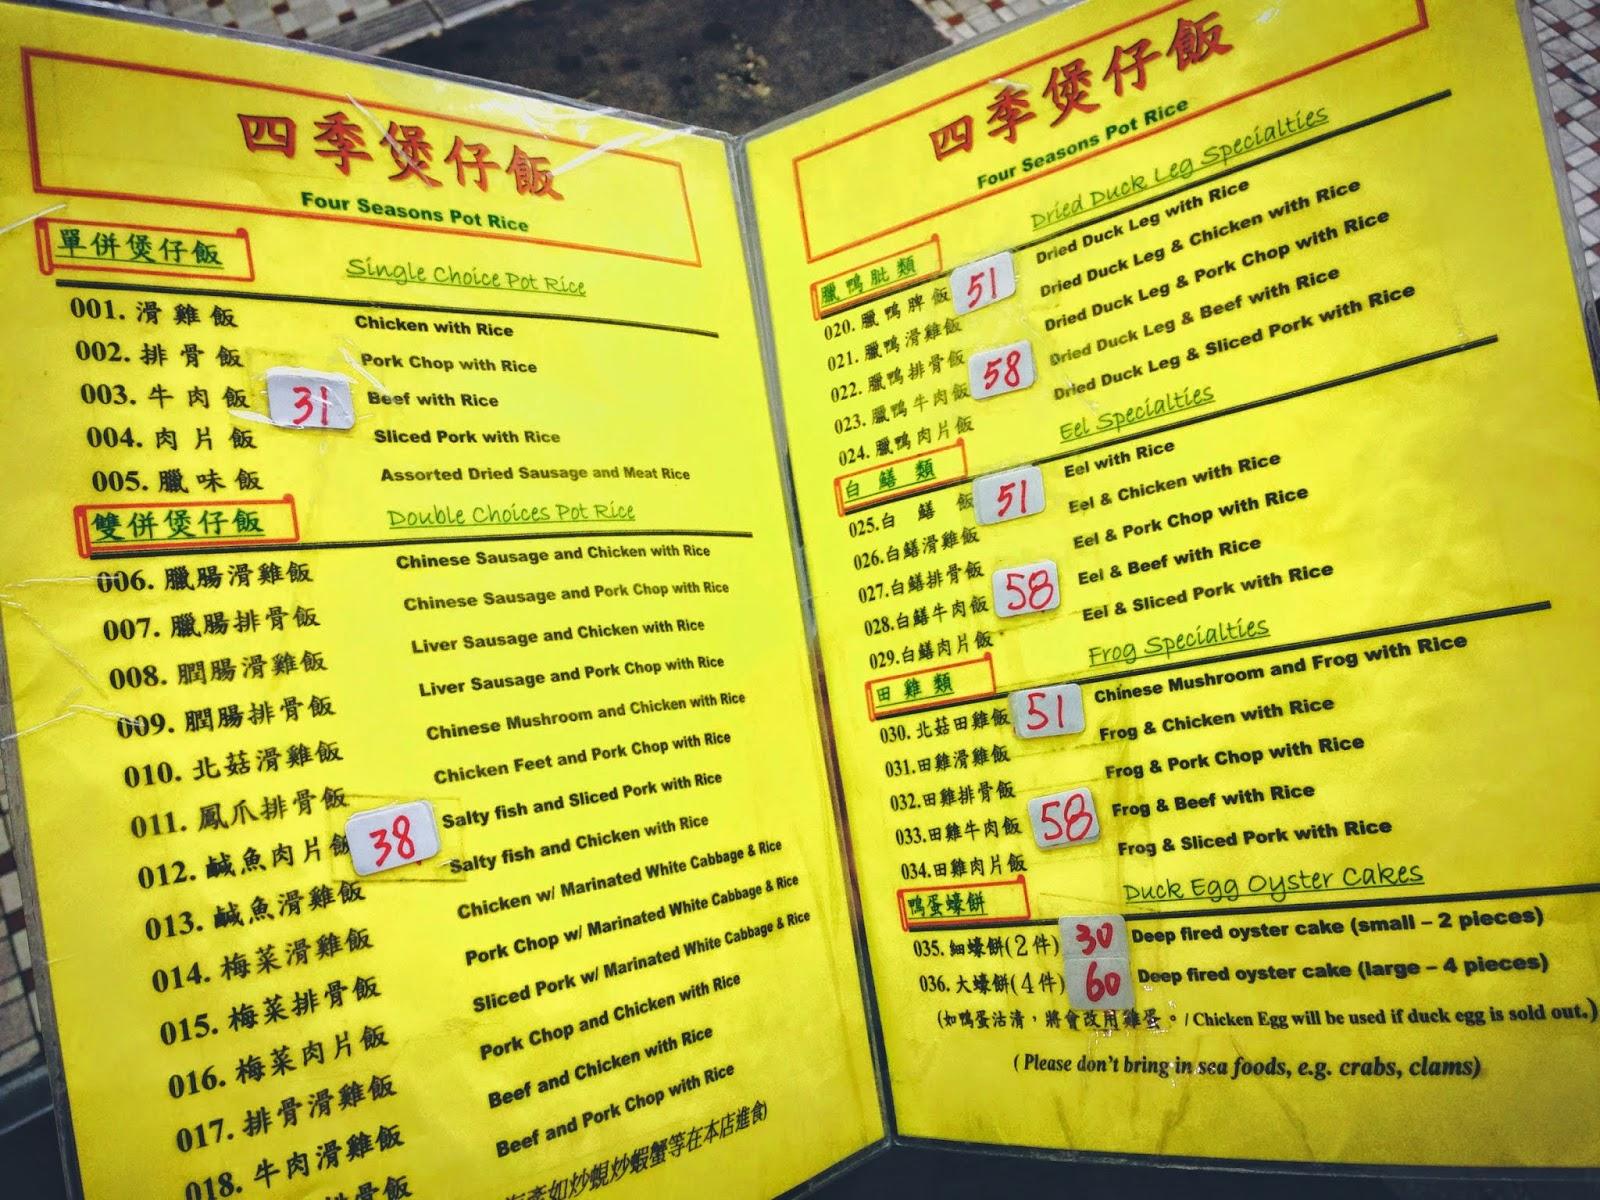 Menu at Four Seasons Claypot Rice Temple St Yau Ma Tei Hong Kong